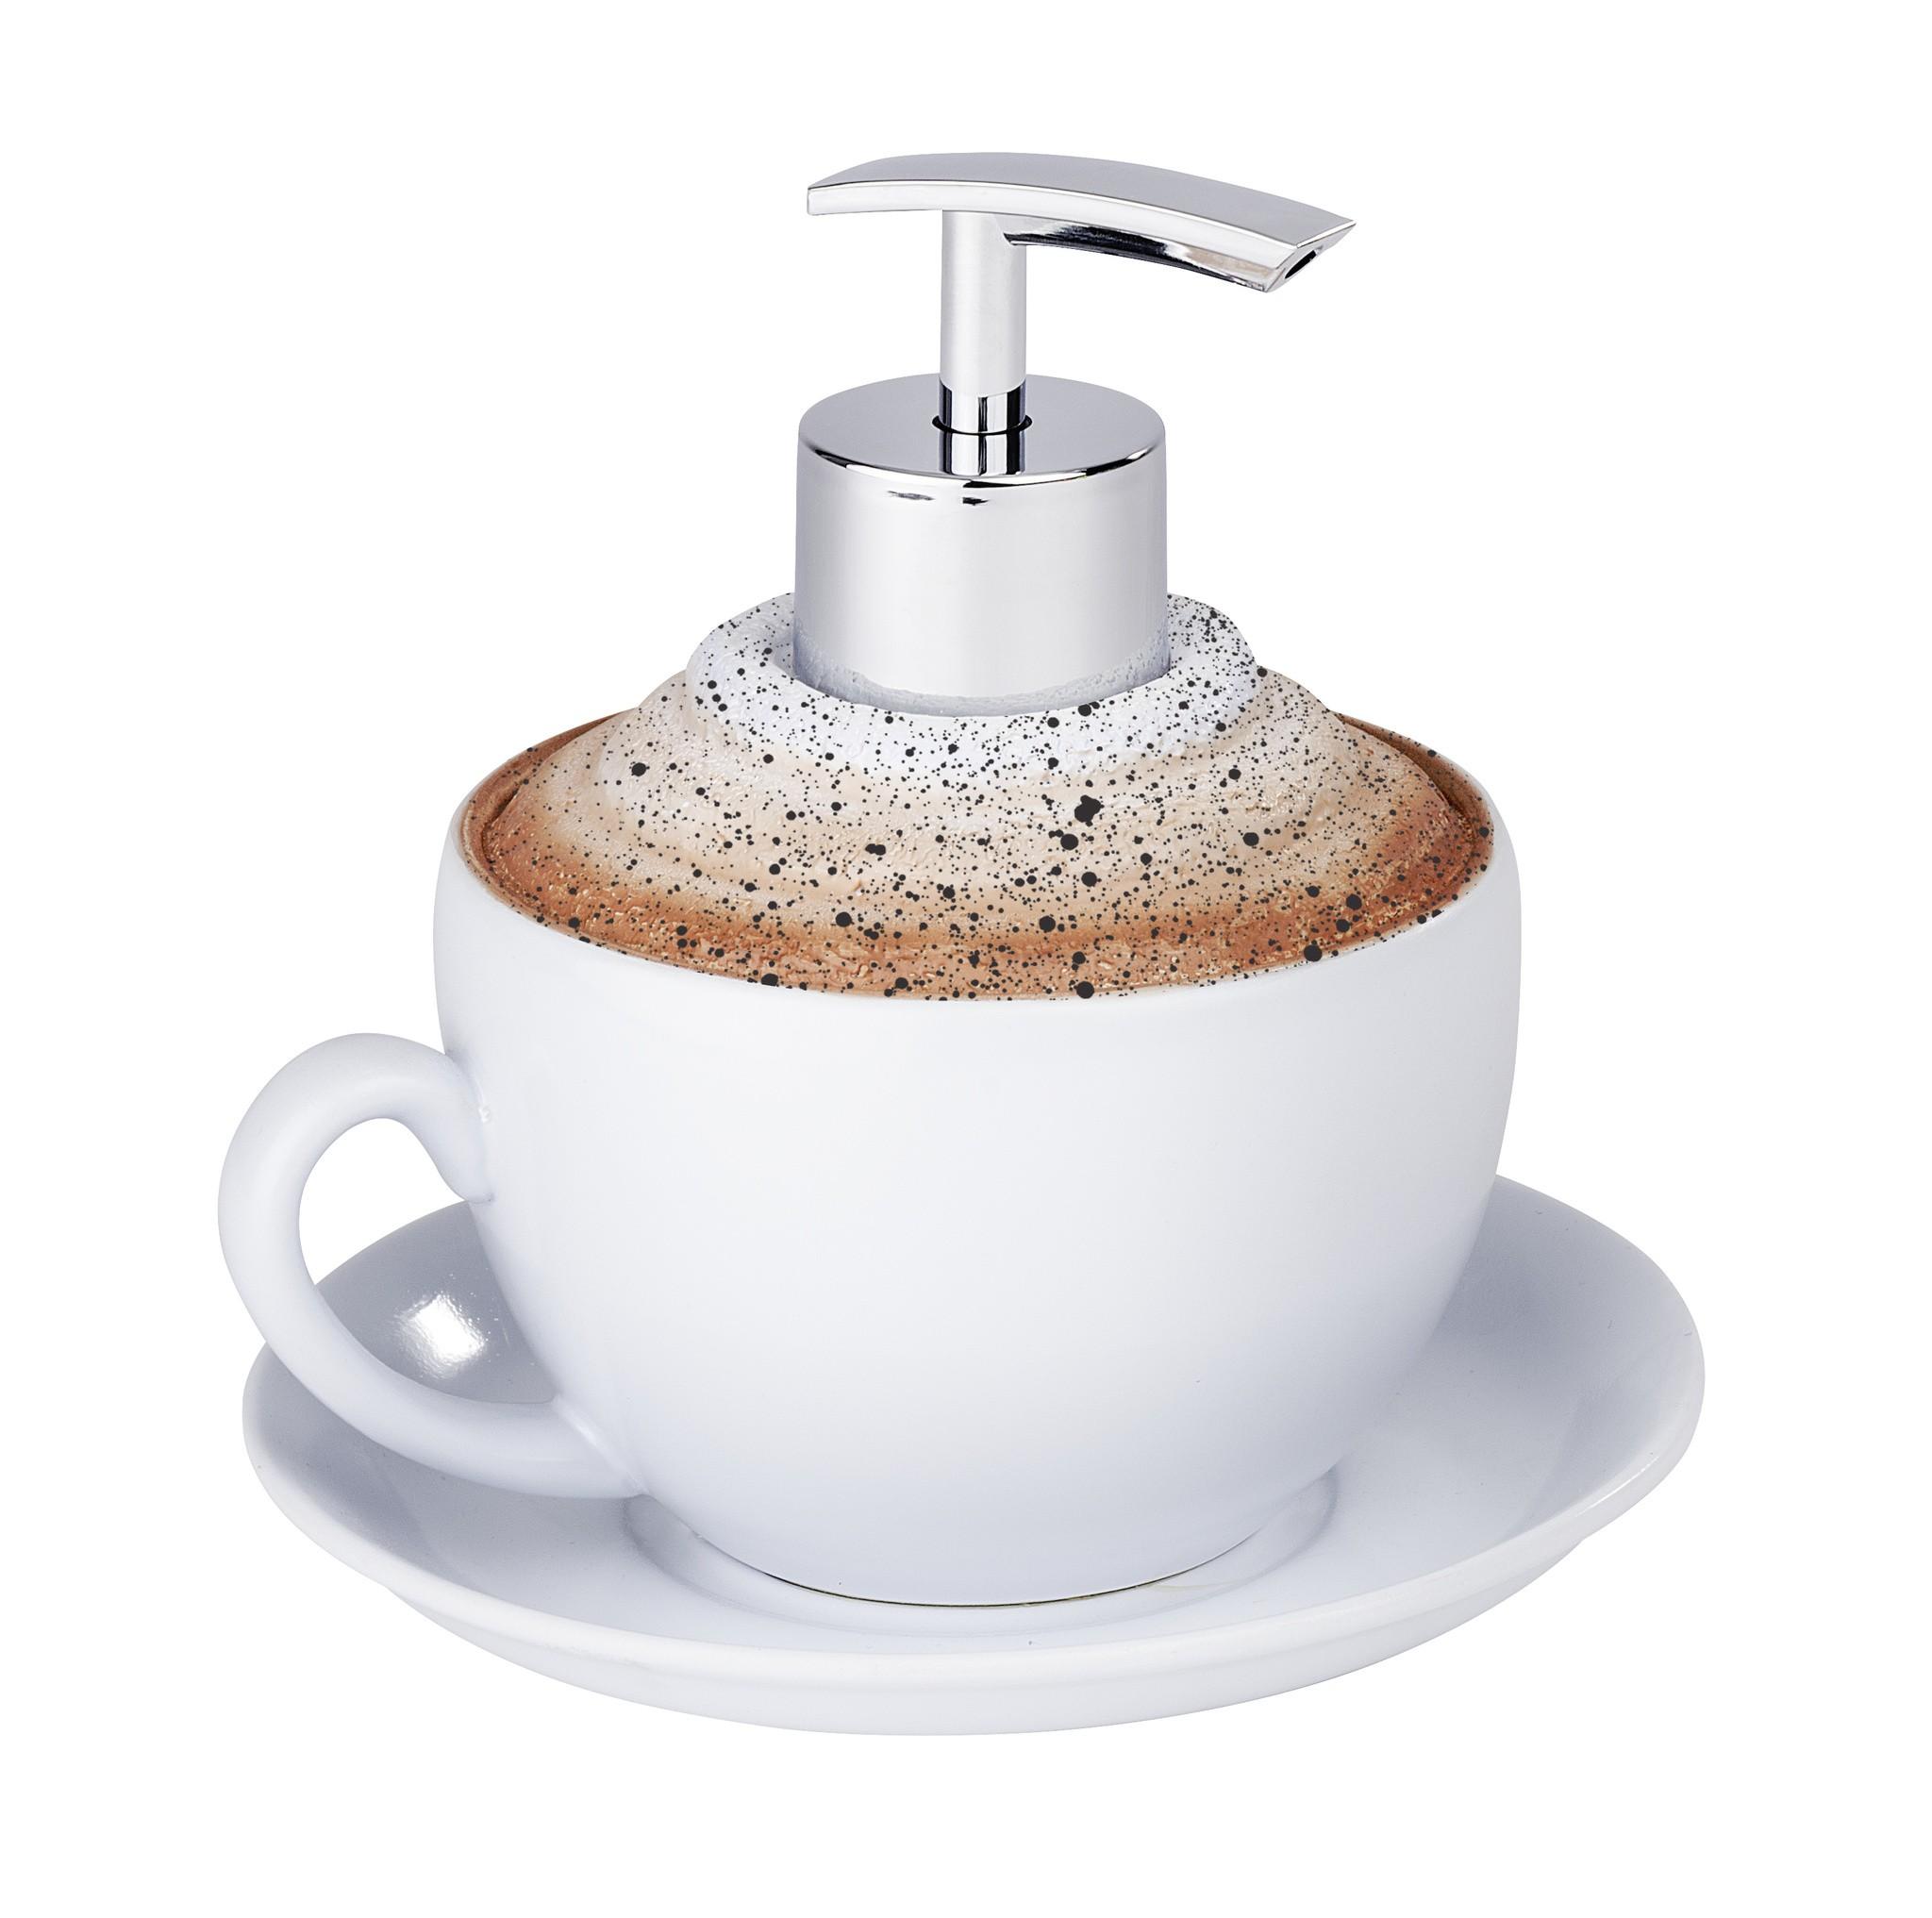 Seifenspender Cappuccino, Spülmittelspender